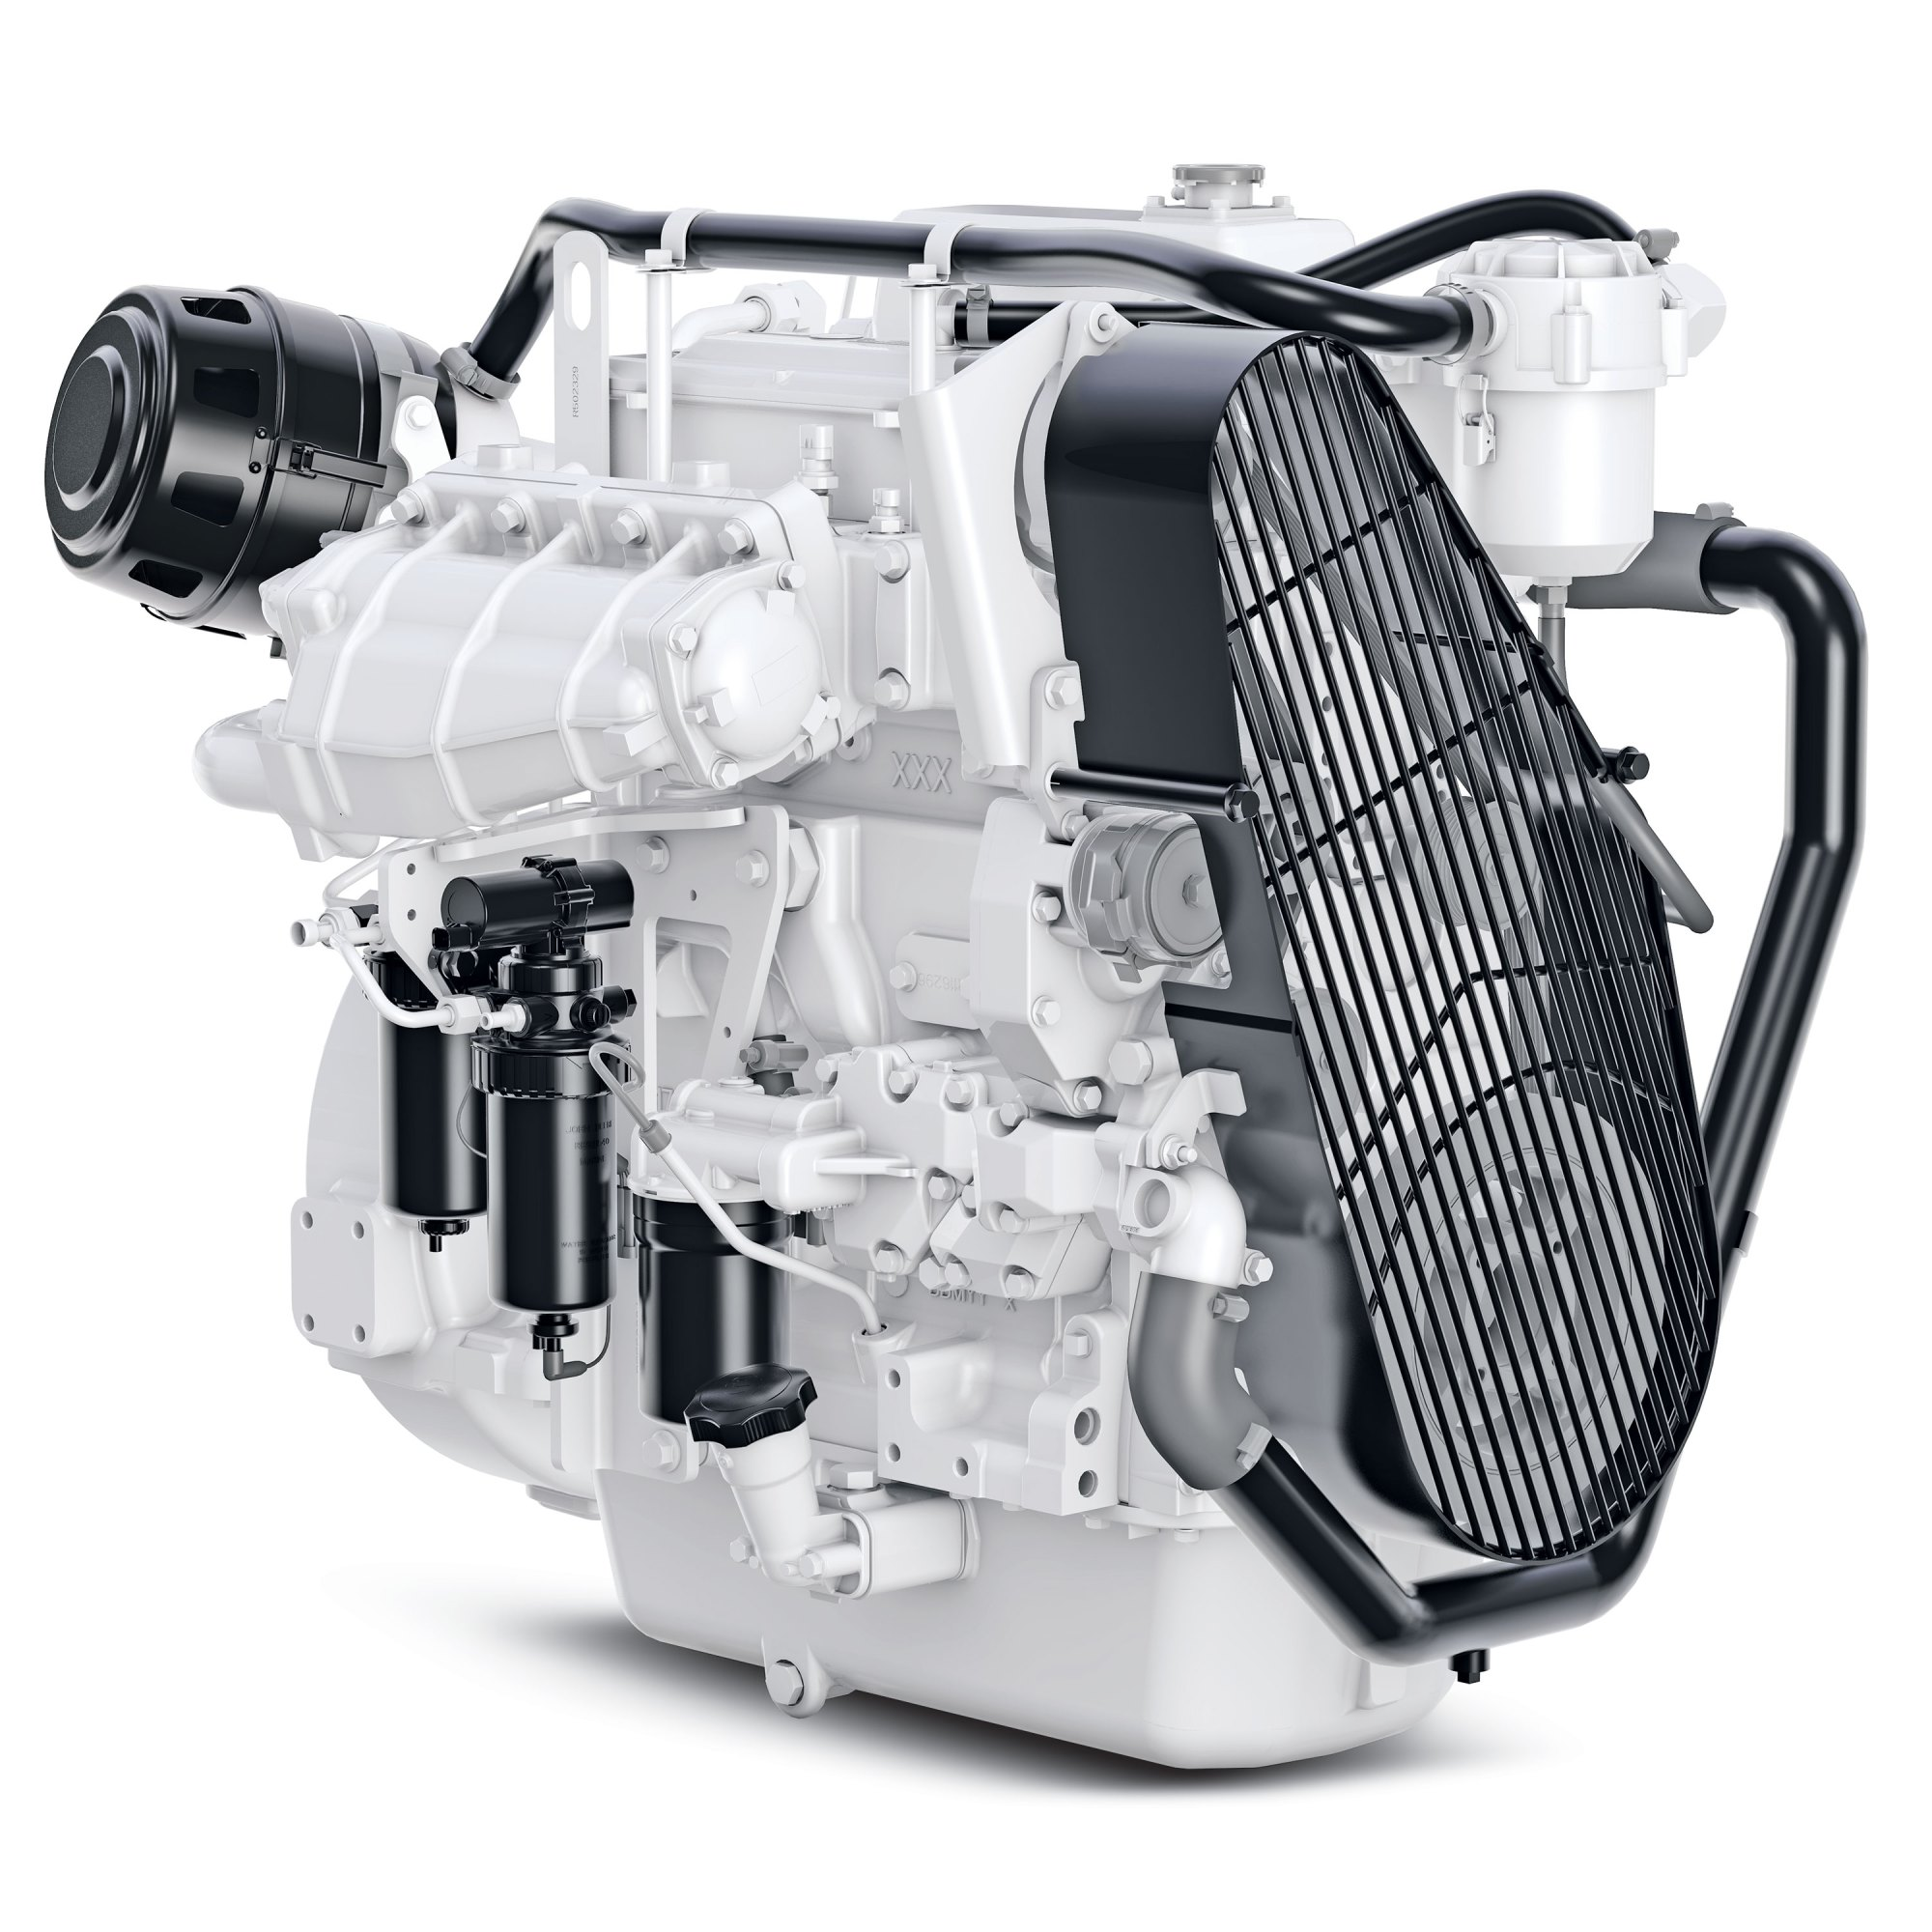 hight resolution of john deere marine engine